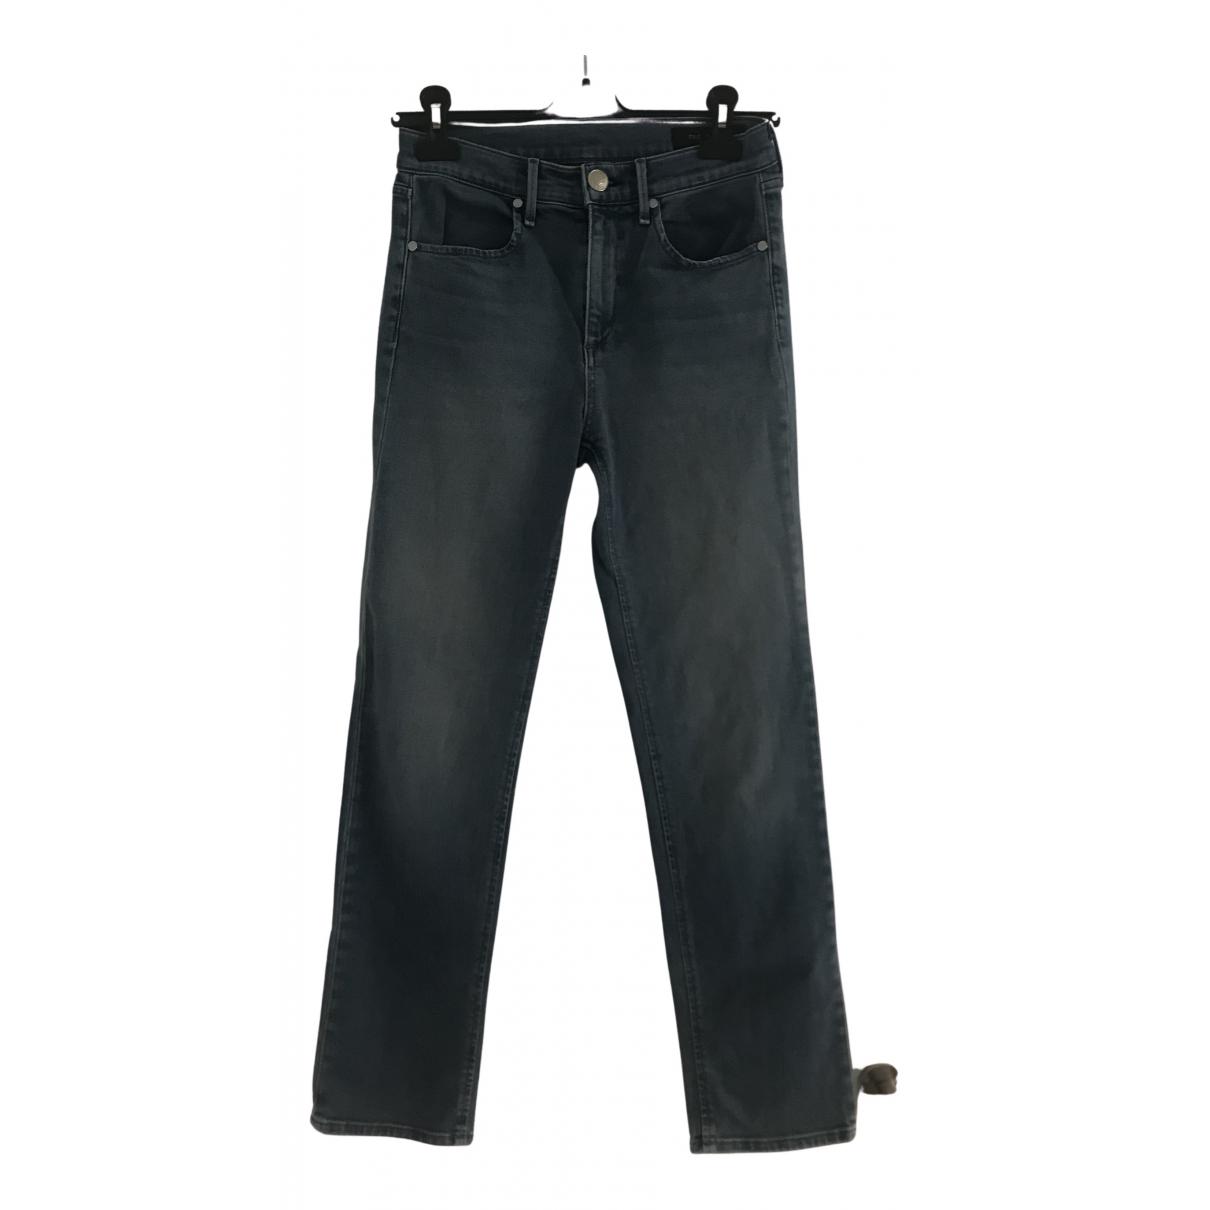 Rag & Bone N Blue Denim - Jeans Jeans for Women 25 US